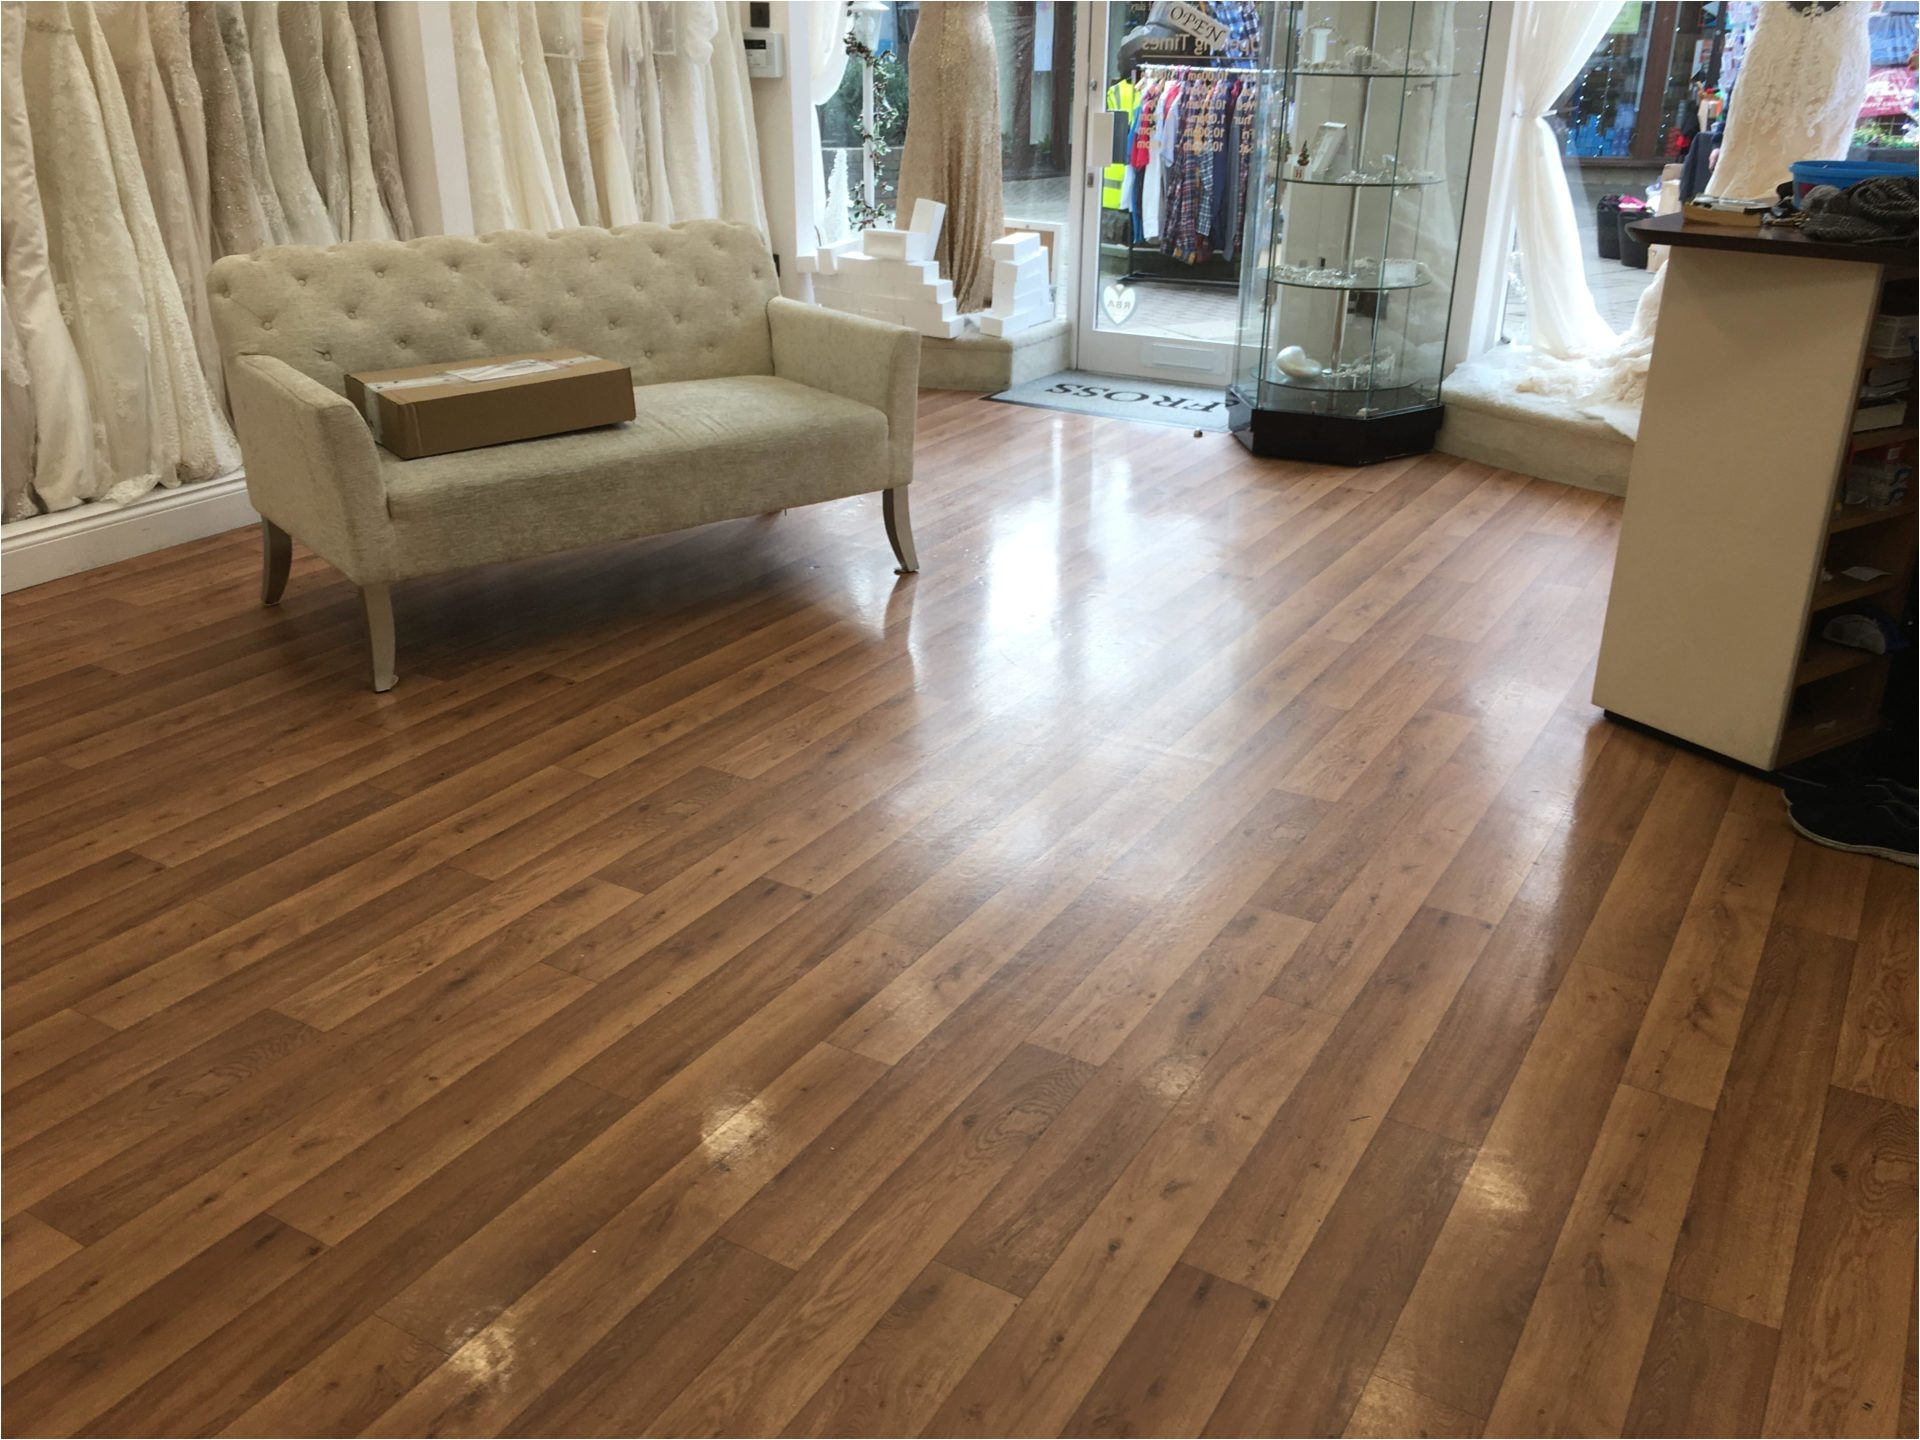 Natural Laminate Wood Floor Cleaner Flooring Machine Best Way To Clean